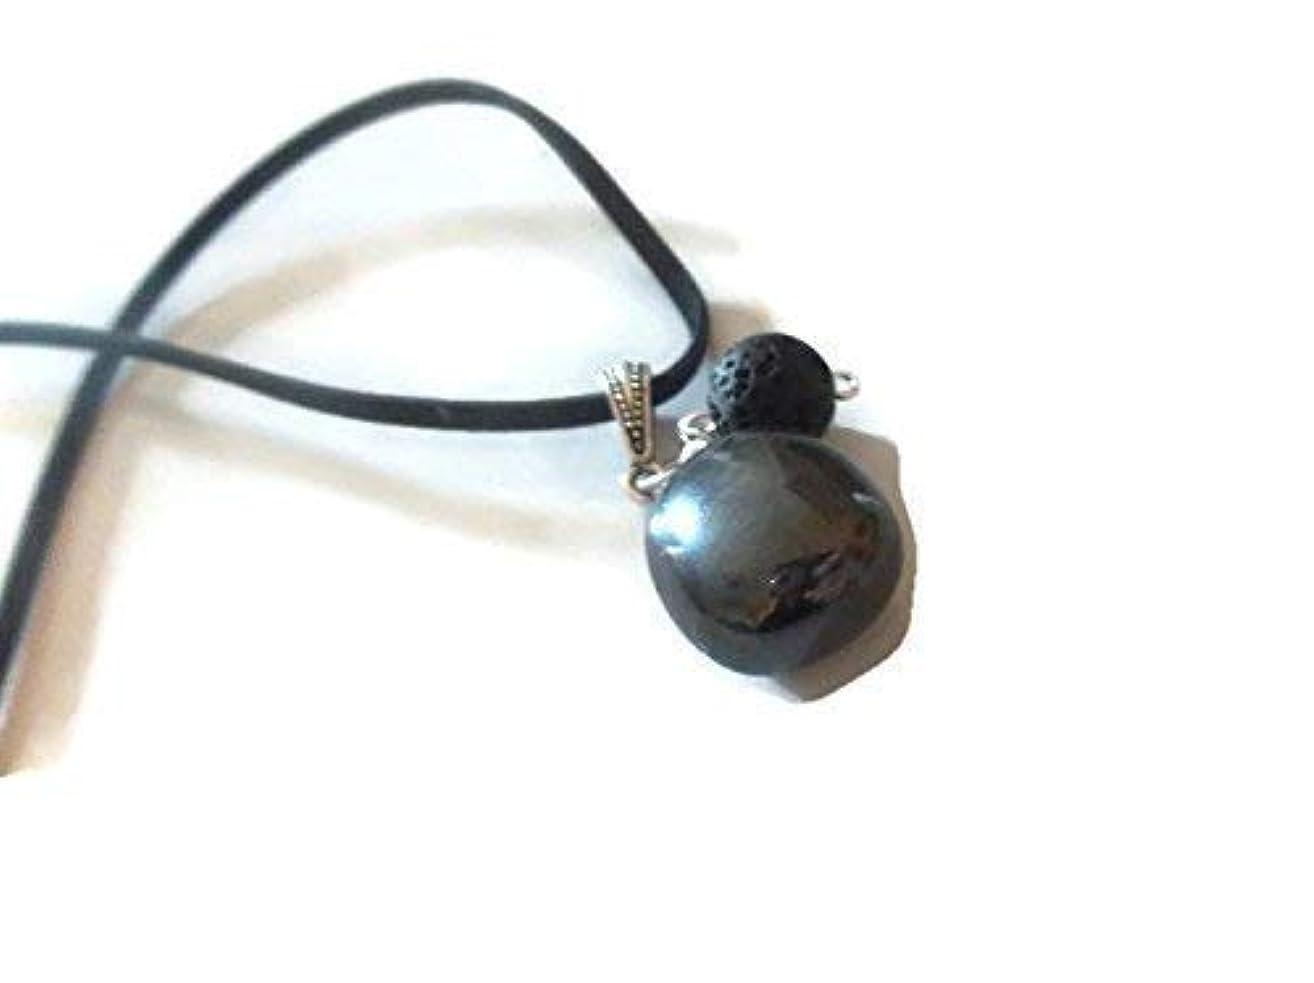 Hematite Gemstone Necklace Lava Rock Aromatherapy Essential Oil Diffuser Pendant Spiritual Crystal Jewelry